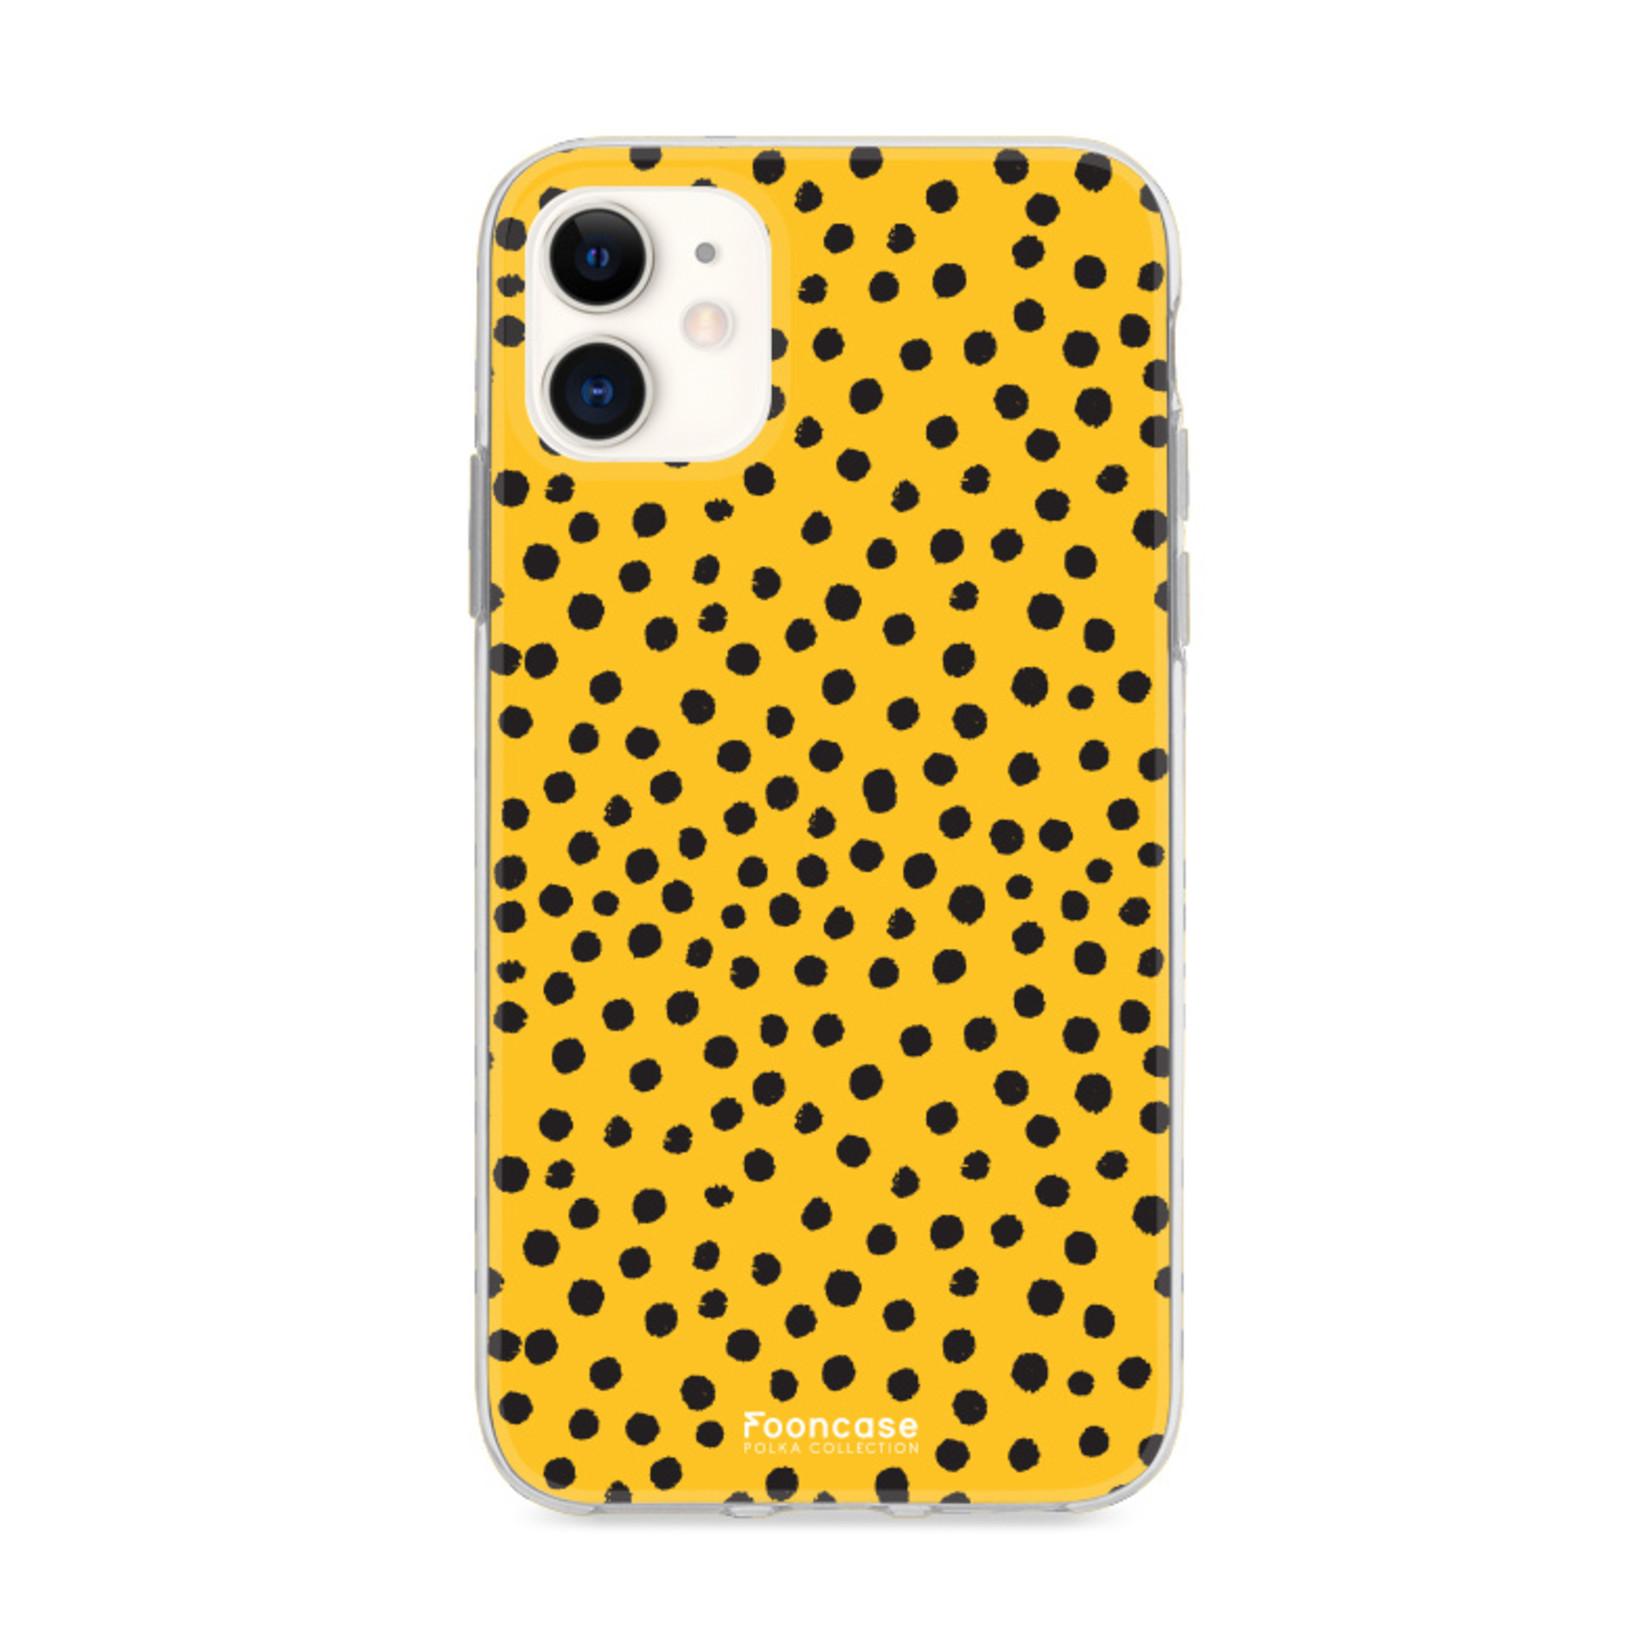 FOONCASE Iphone 11 - POLKA COLLECTION / Ockergelb